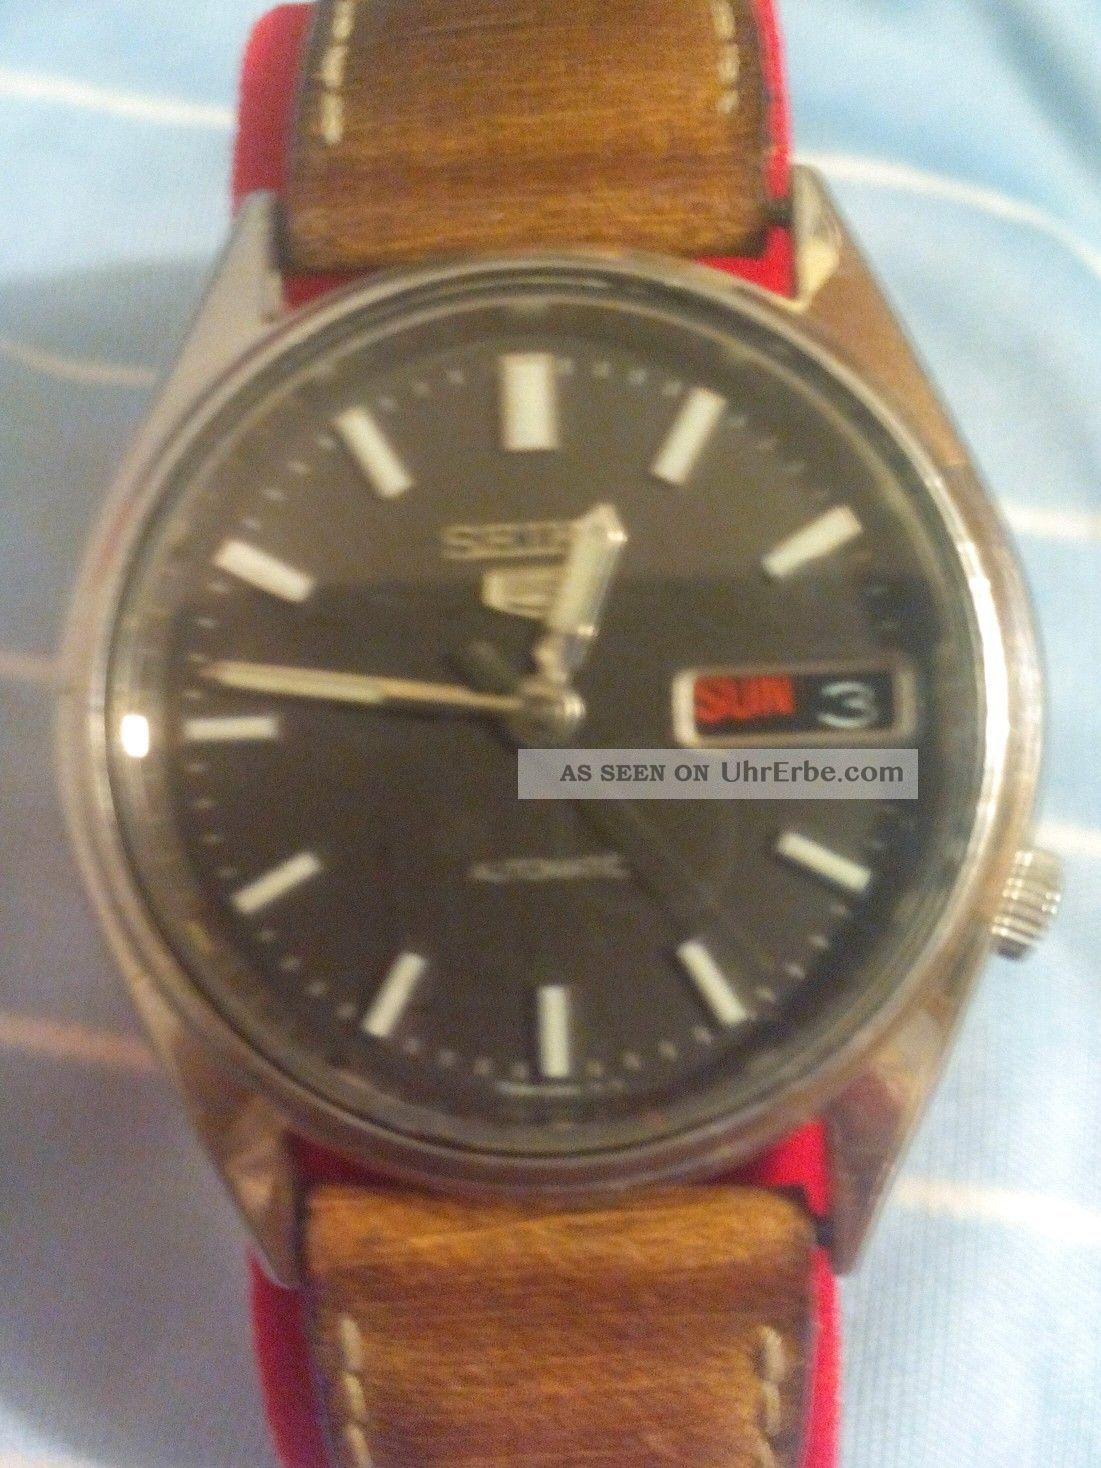 Herrenarmbanduhr Seiko 5,  Automatic,  Kal.  7s26a,  90er Jahre Datum & Tag Anzeige Armbanduhren Bild